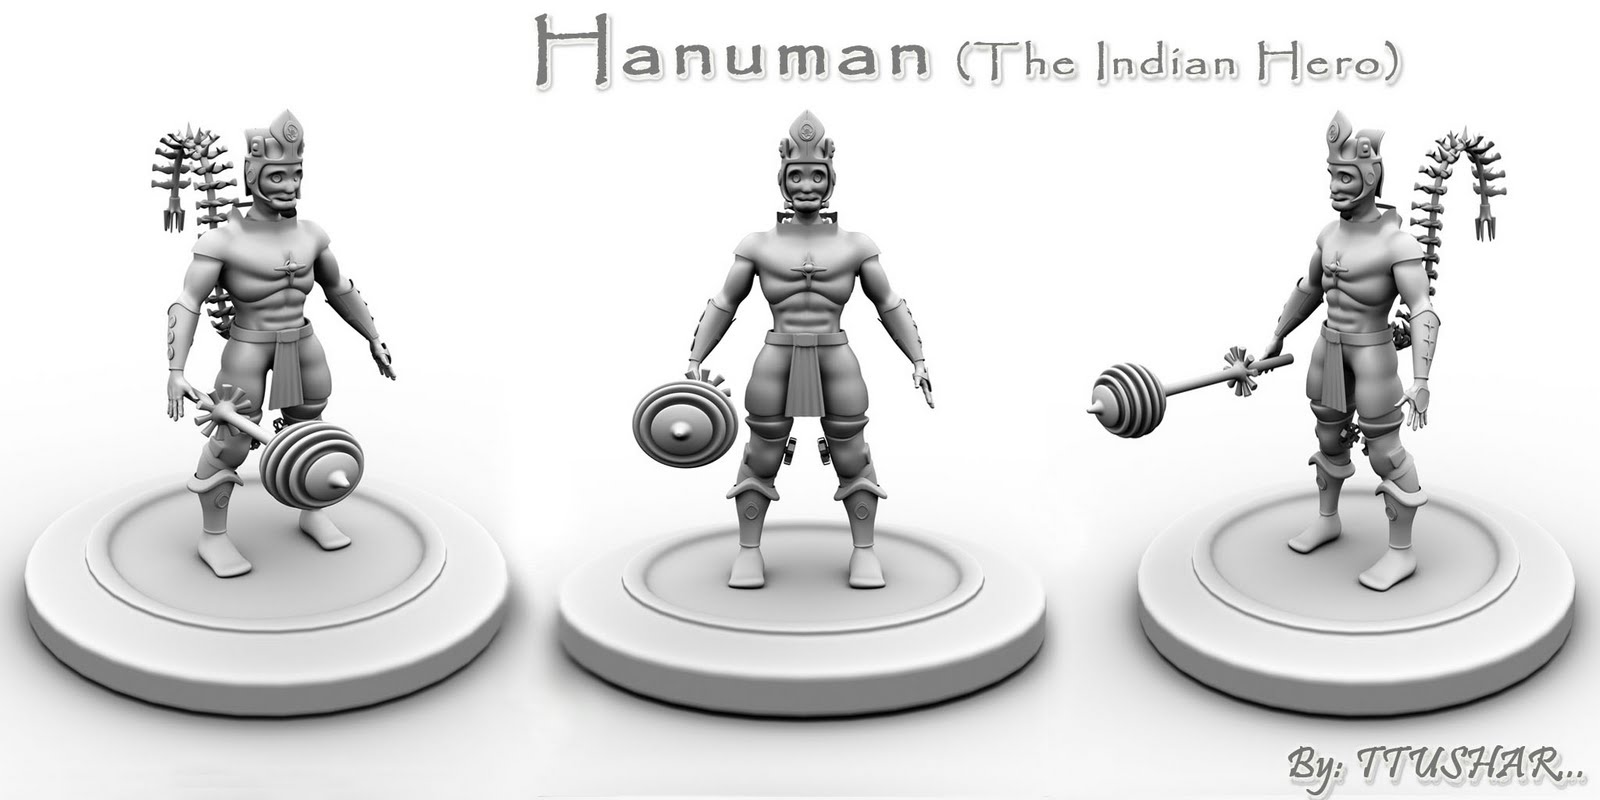 http://3.bp.blogspot.com/-9XrpCTAh54c/Tdcqk4GePHI/AAAAAAAAABk/SyeDkCvH_TI/s1600/Hanuman%2BJi.jpg